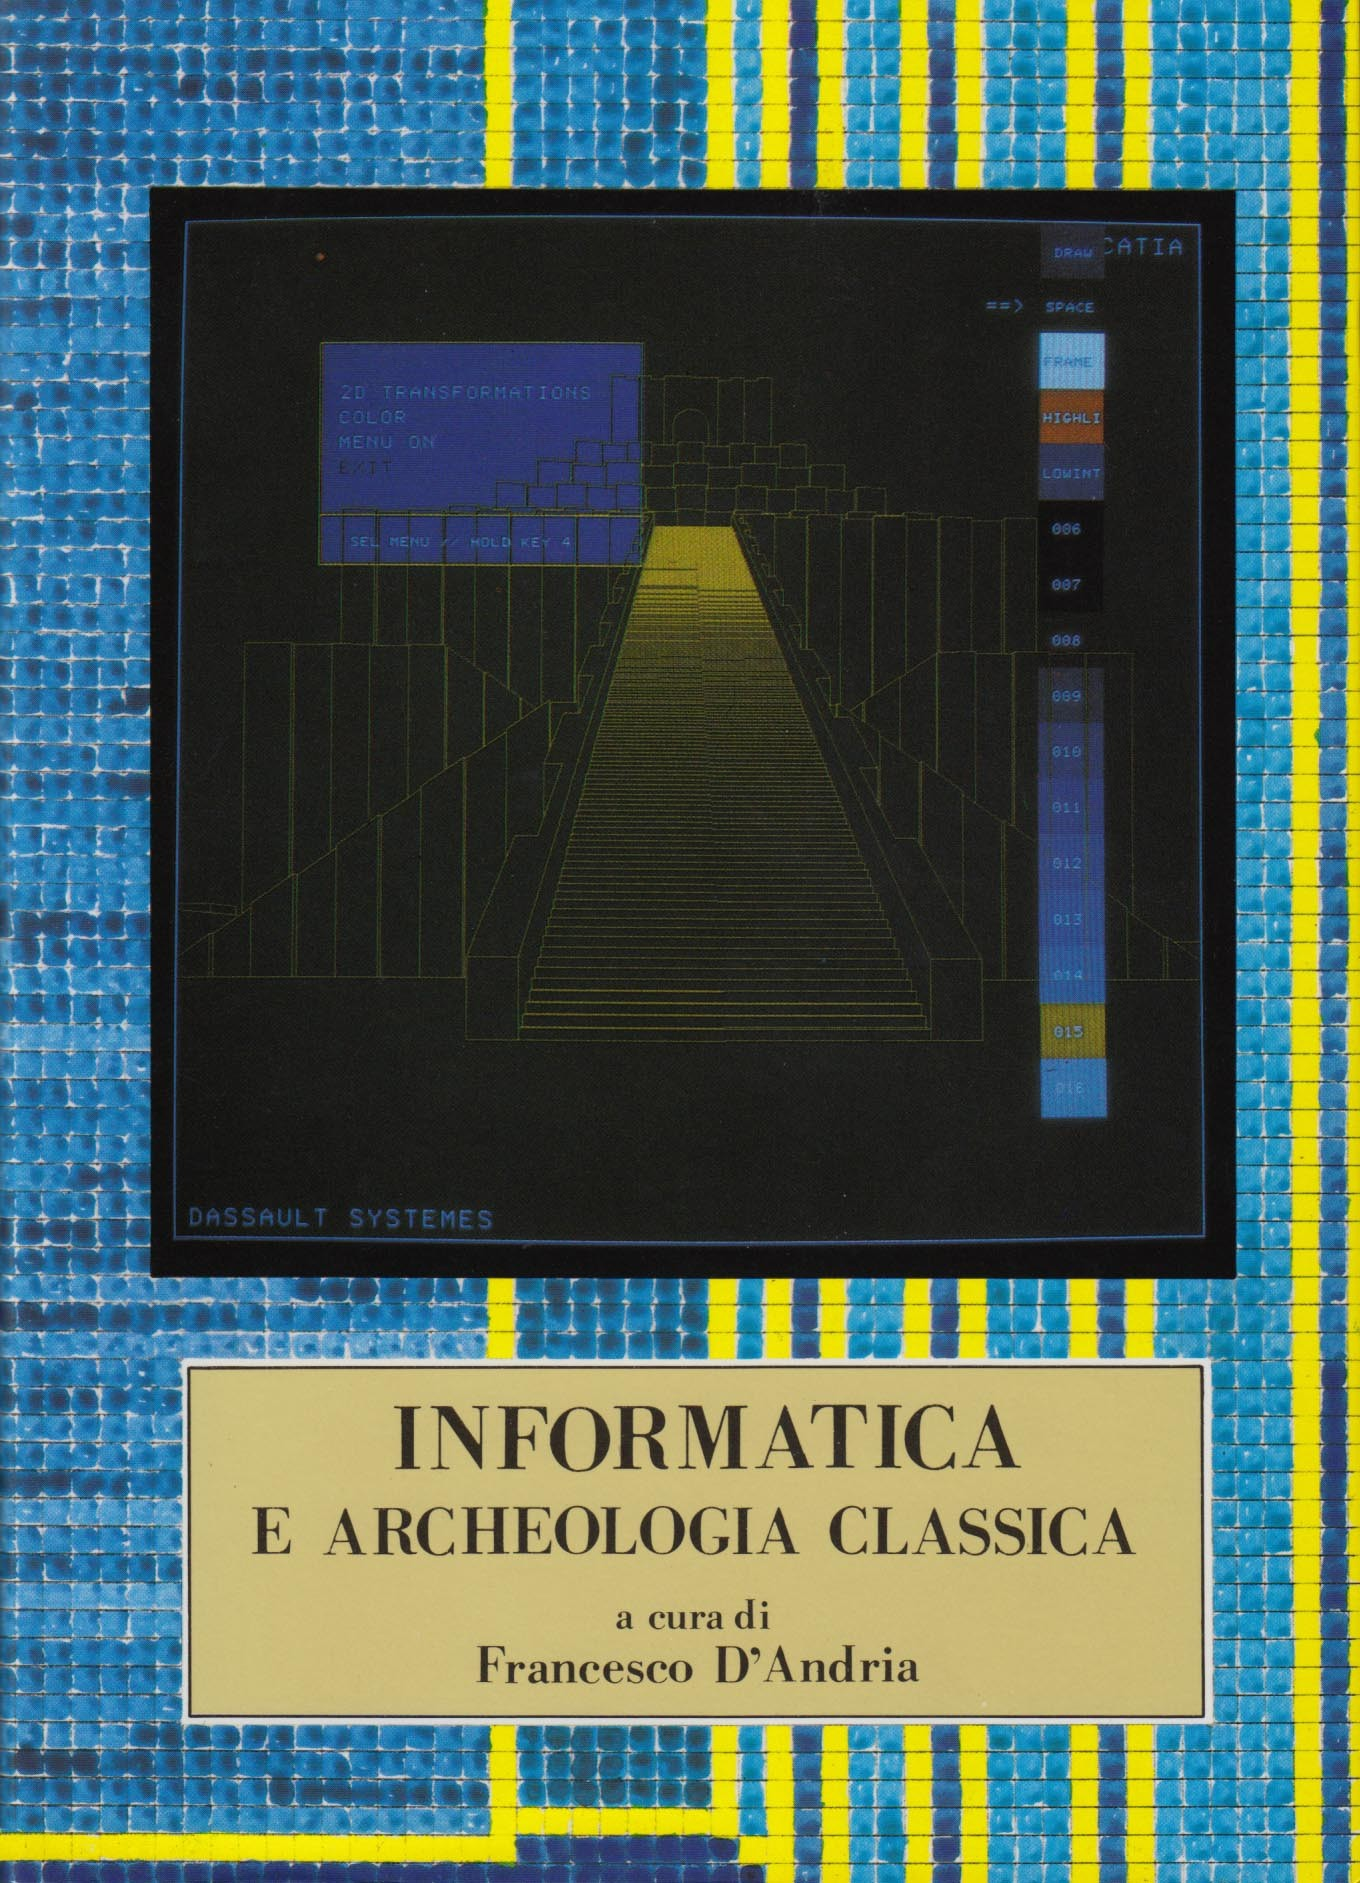 Informatica e archeologia classica